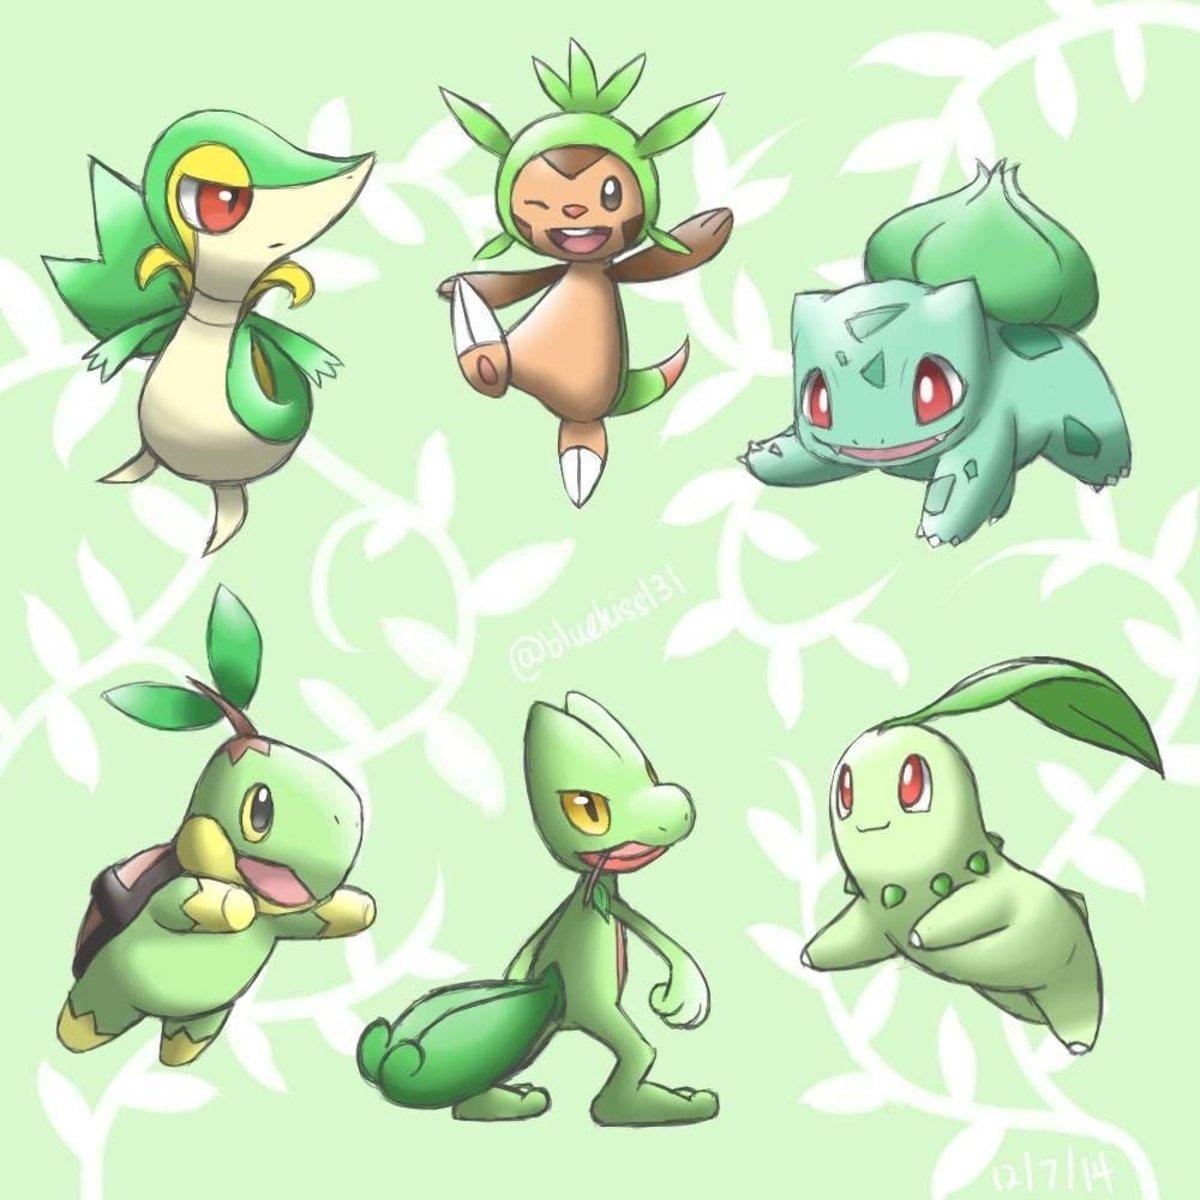 Pokemon: Top 3 Grass Type Starters